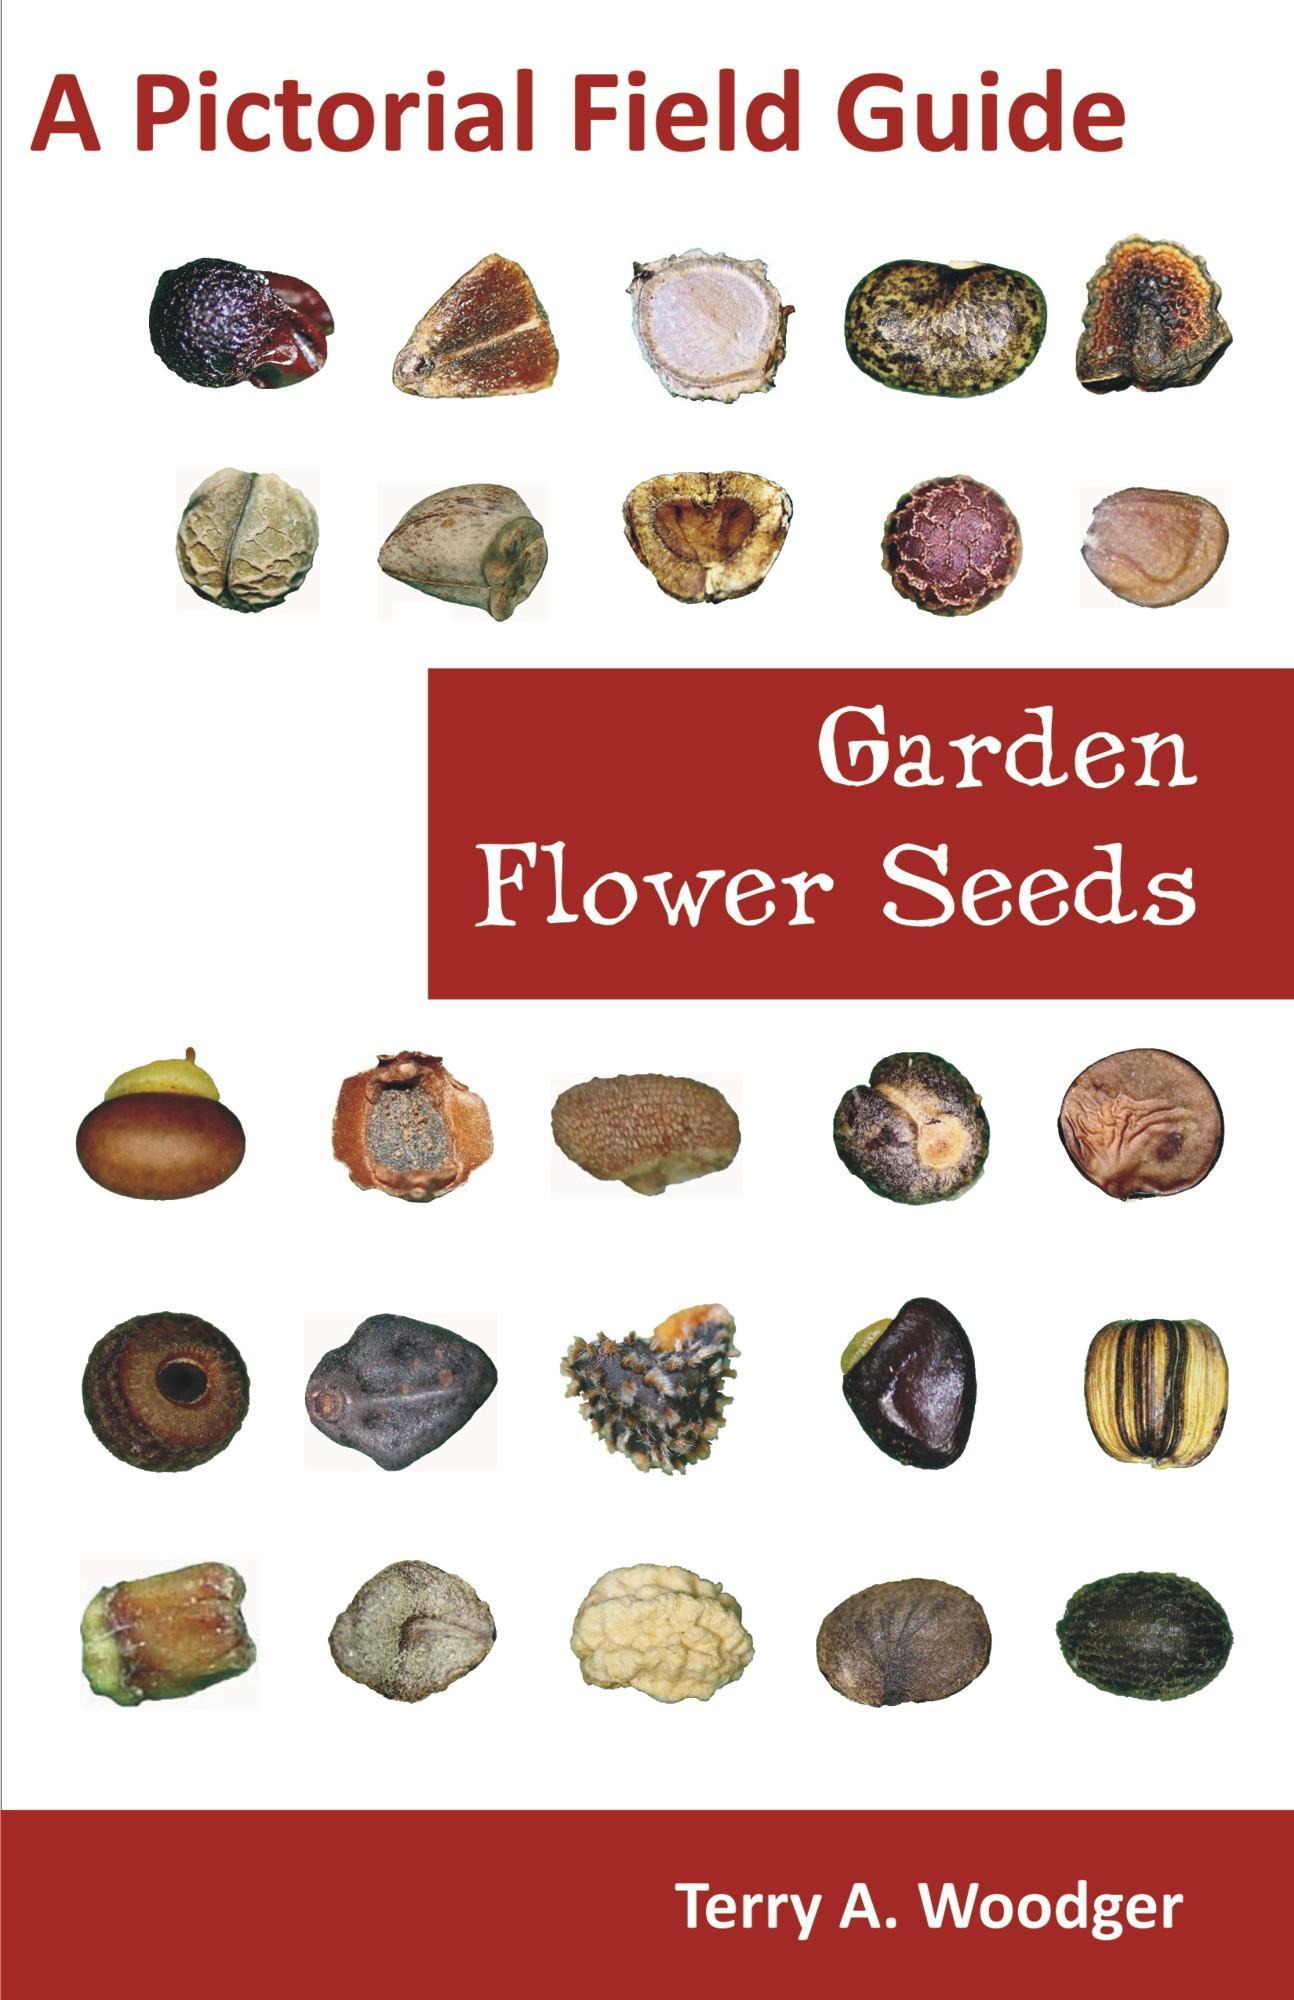 Garden Flower Seeds: A Pictorial Field Guide EB9781612330549